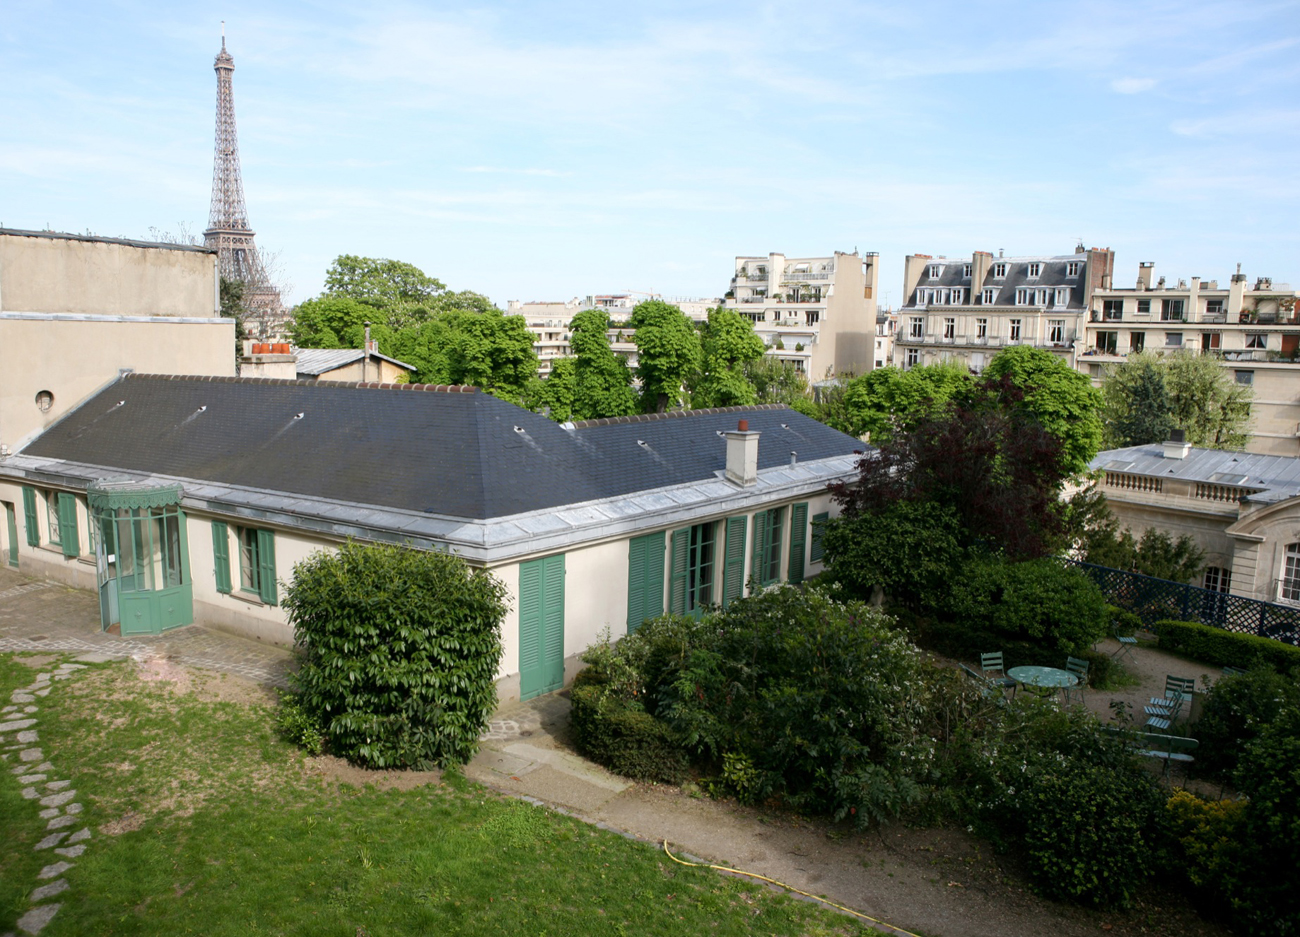 La Maison de Balzac Paris